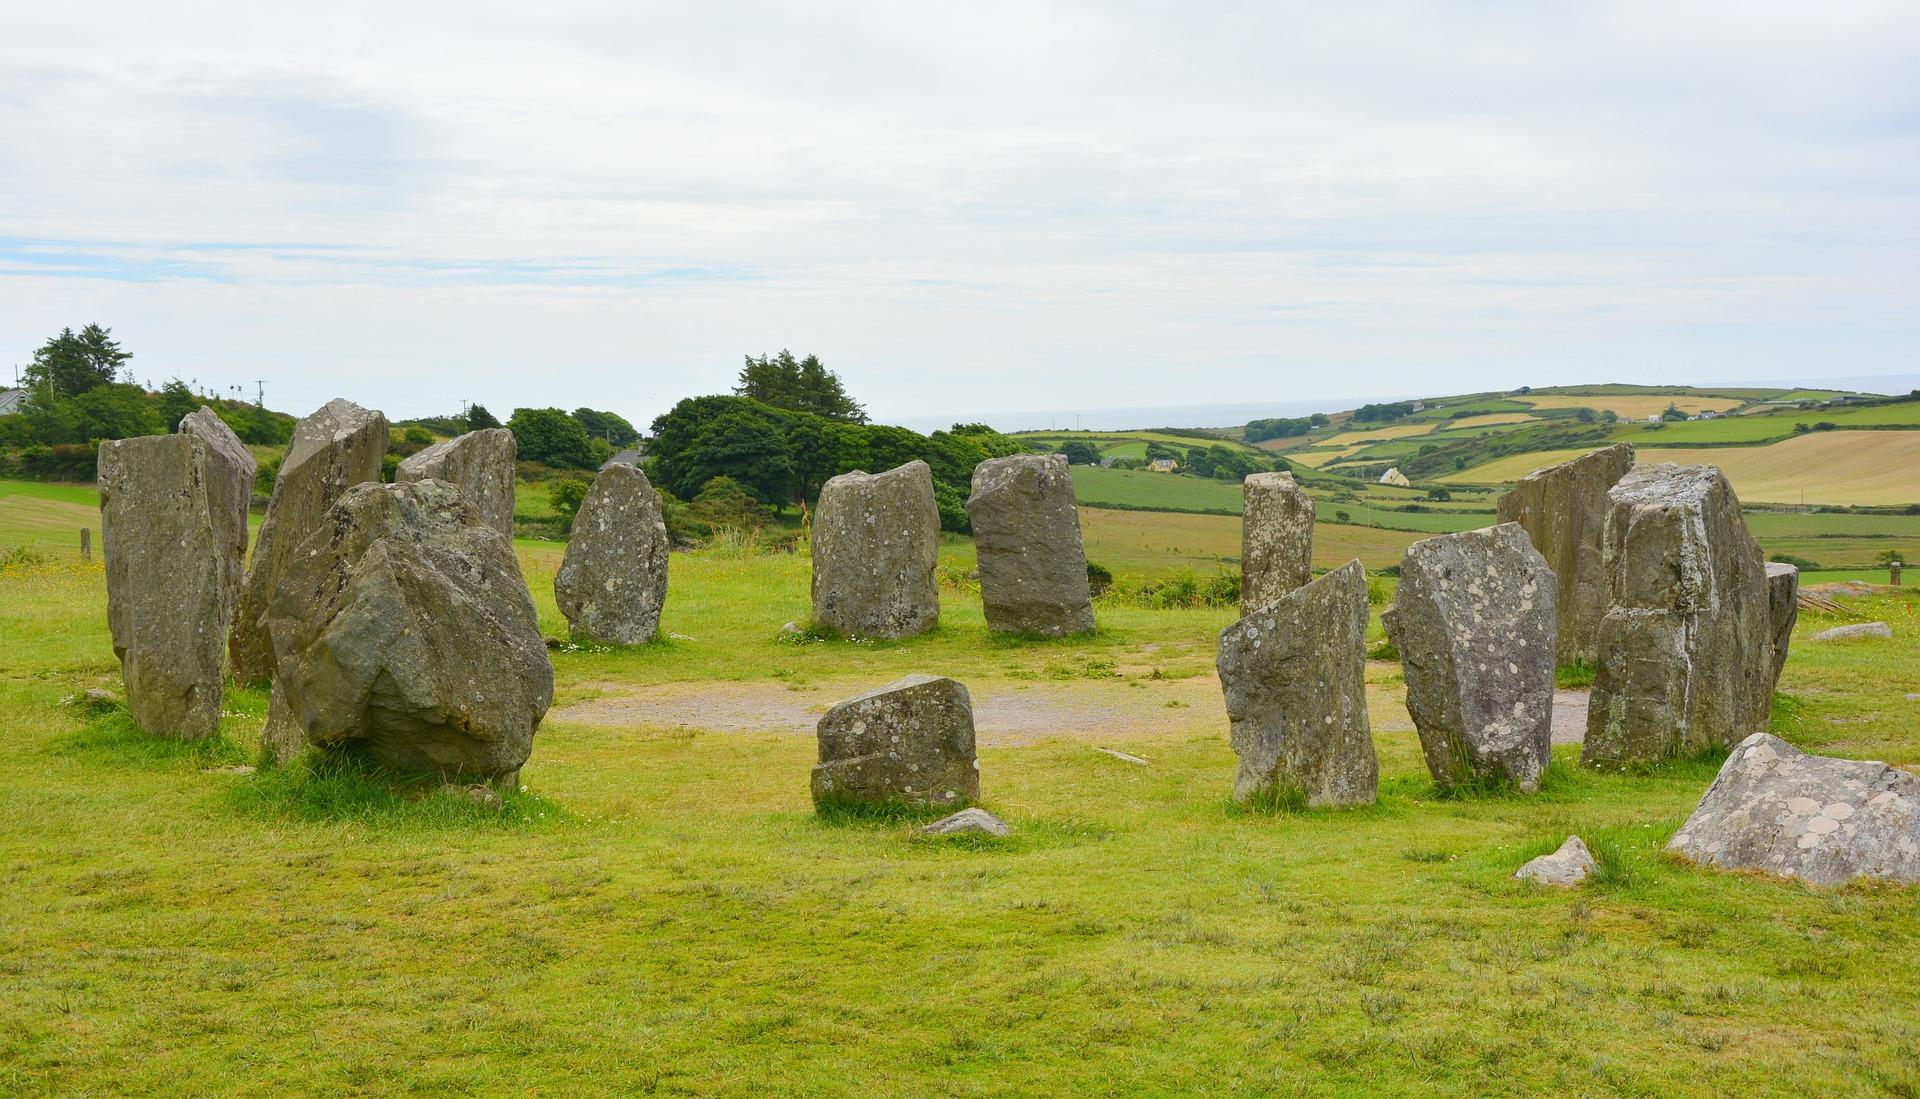 stone-circle-1477834_1920